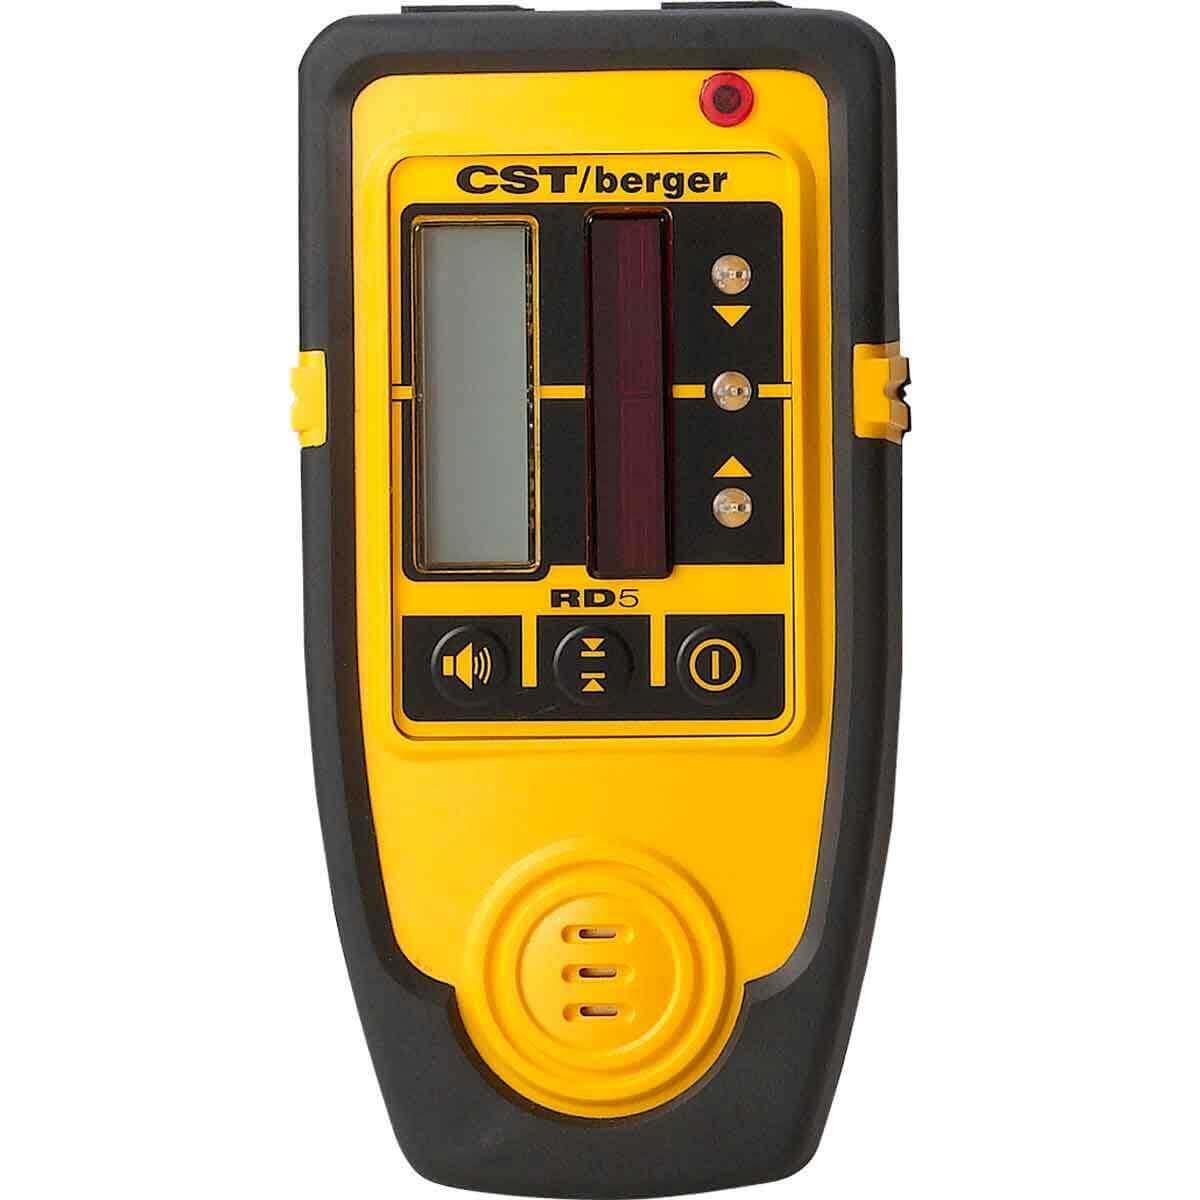 Range finder CST self leveling rotary laser